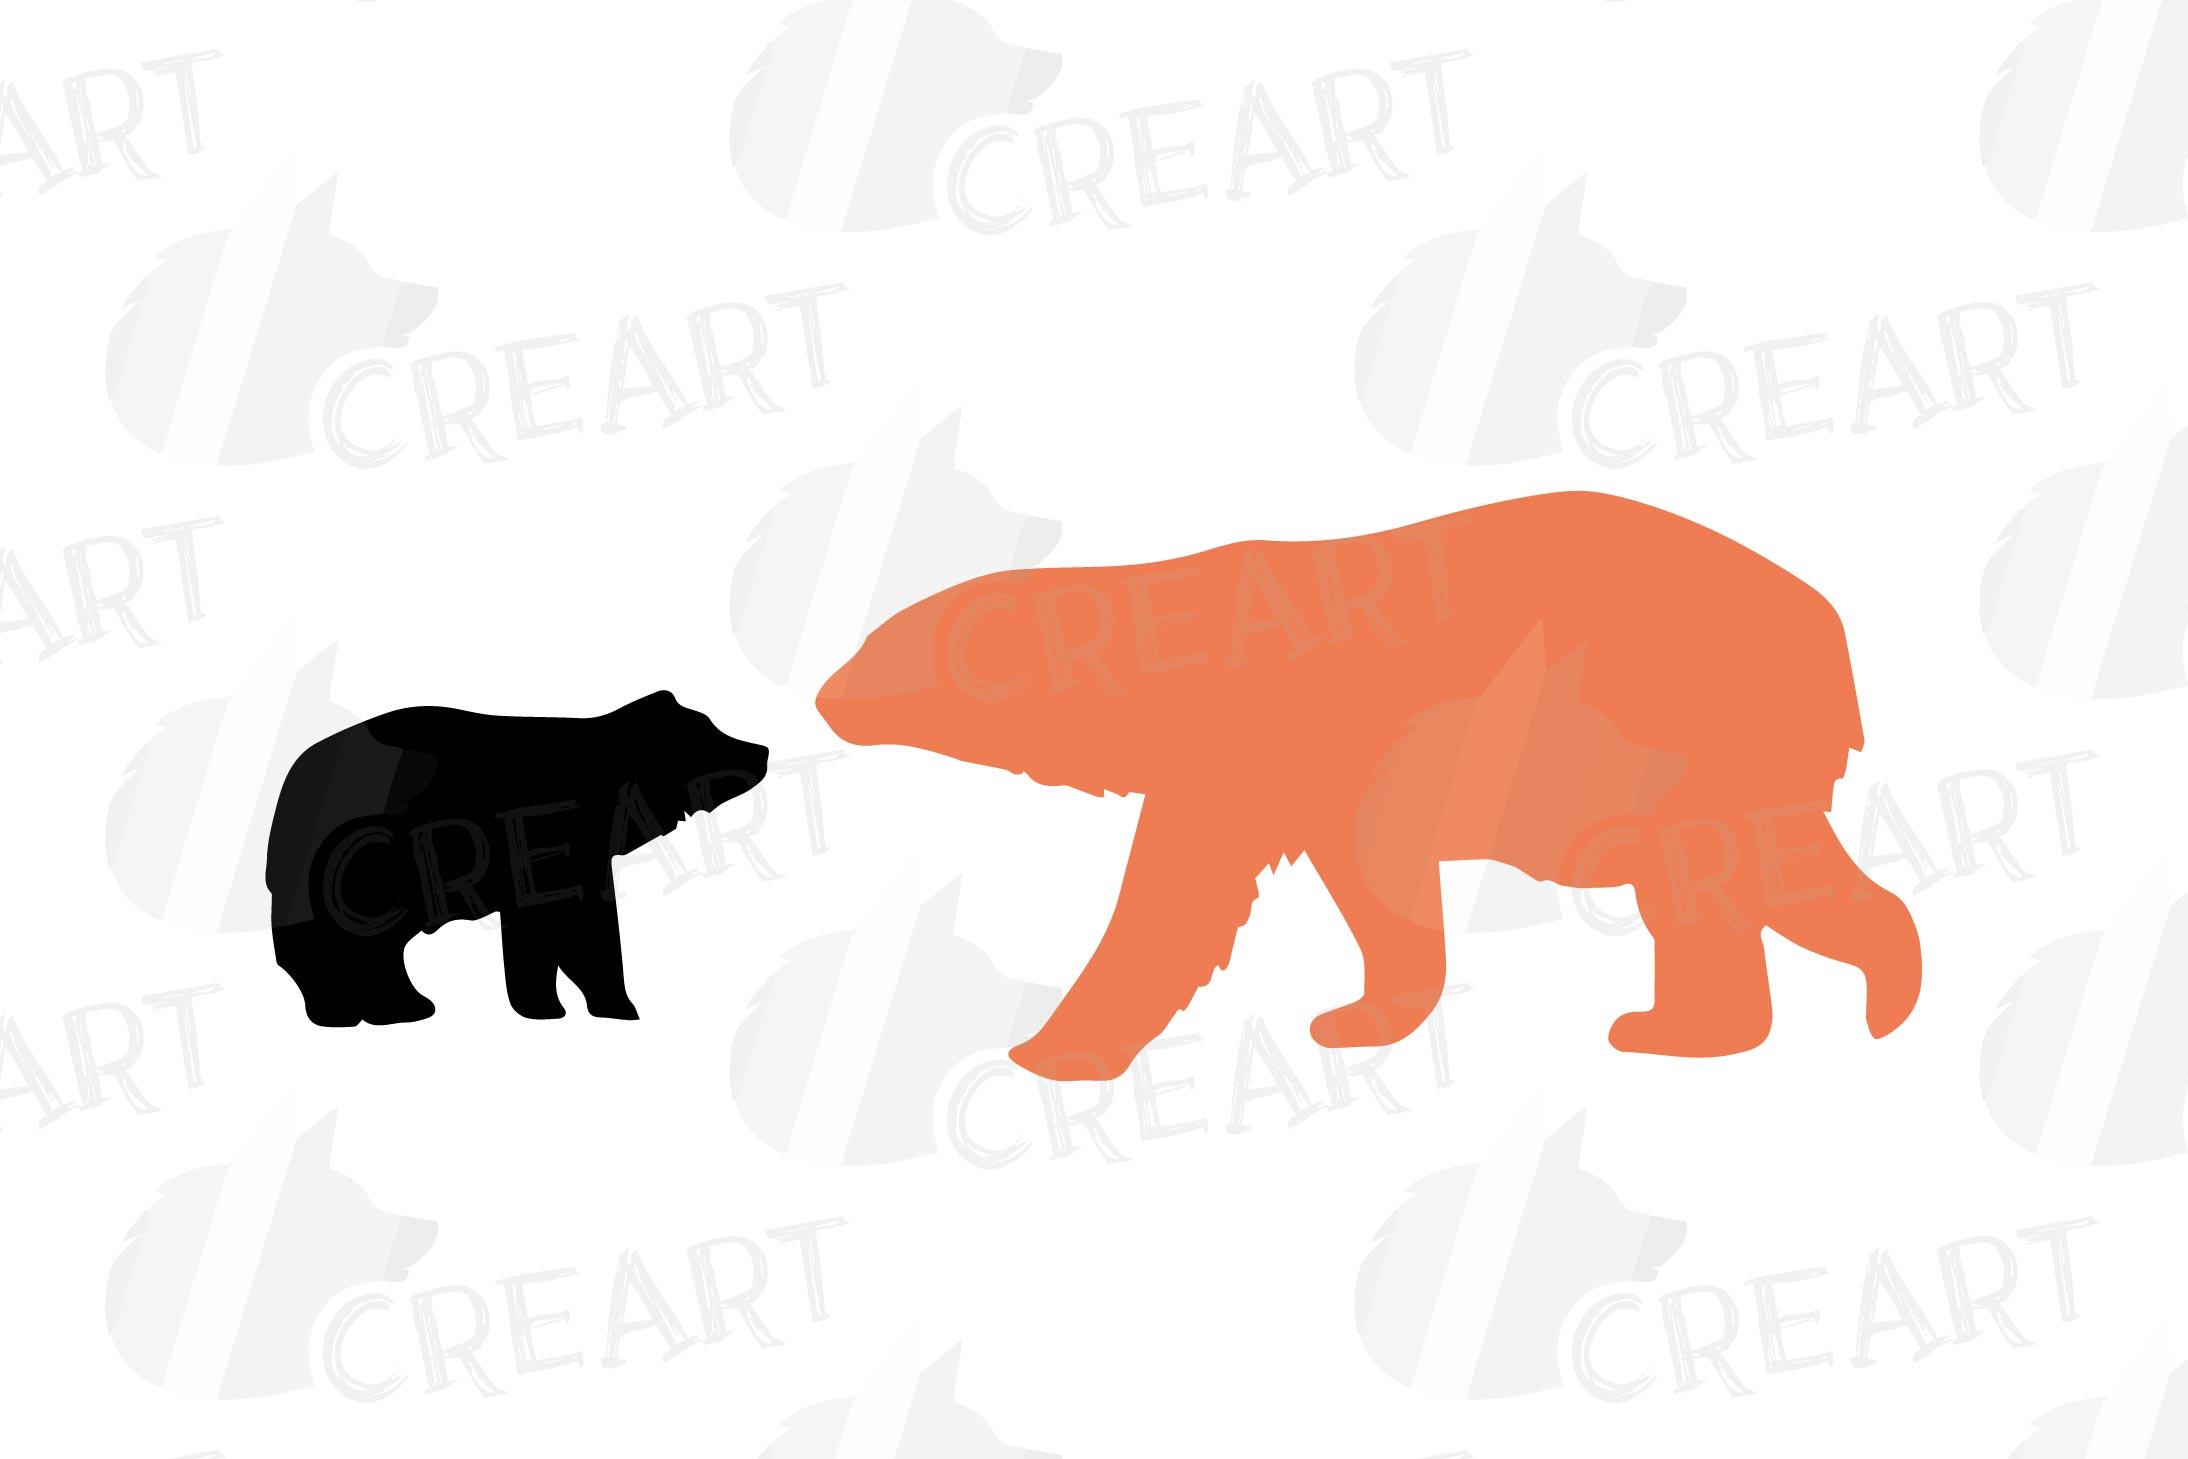 Baby and mama bear nursery clip art collection, bears print example image 11